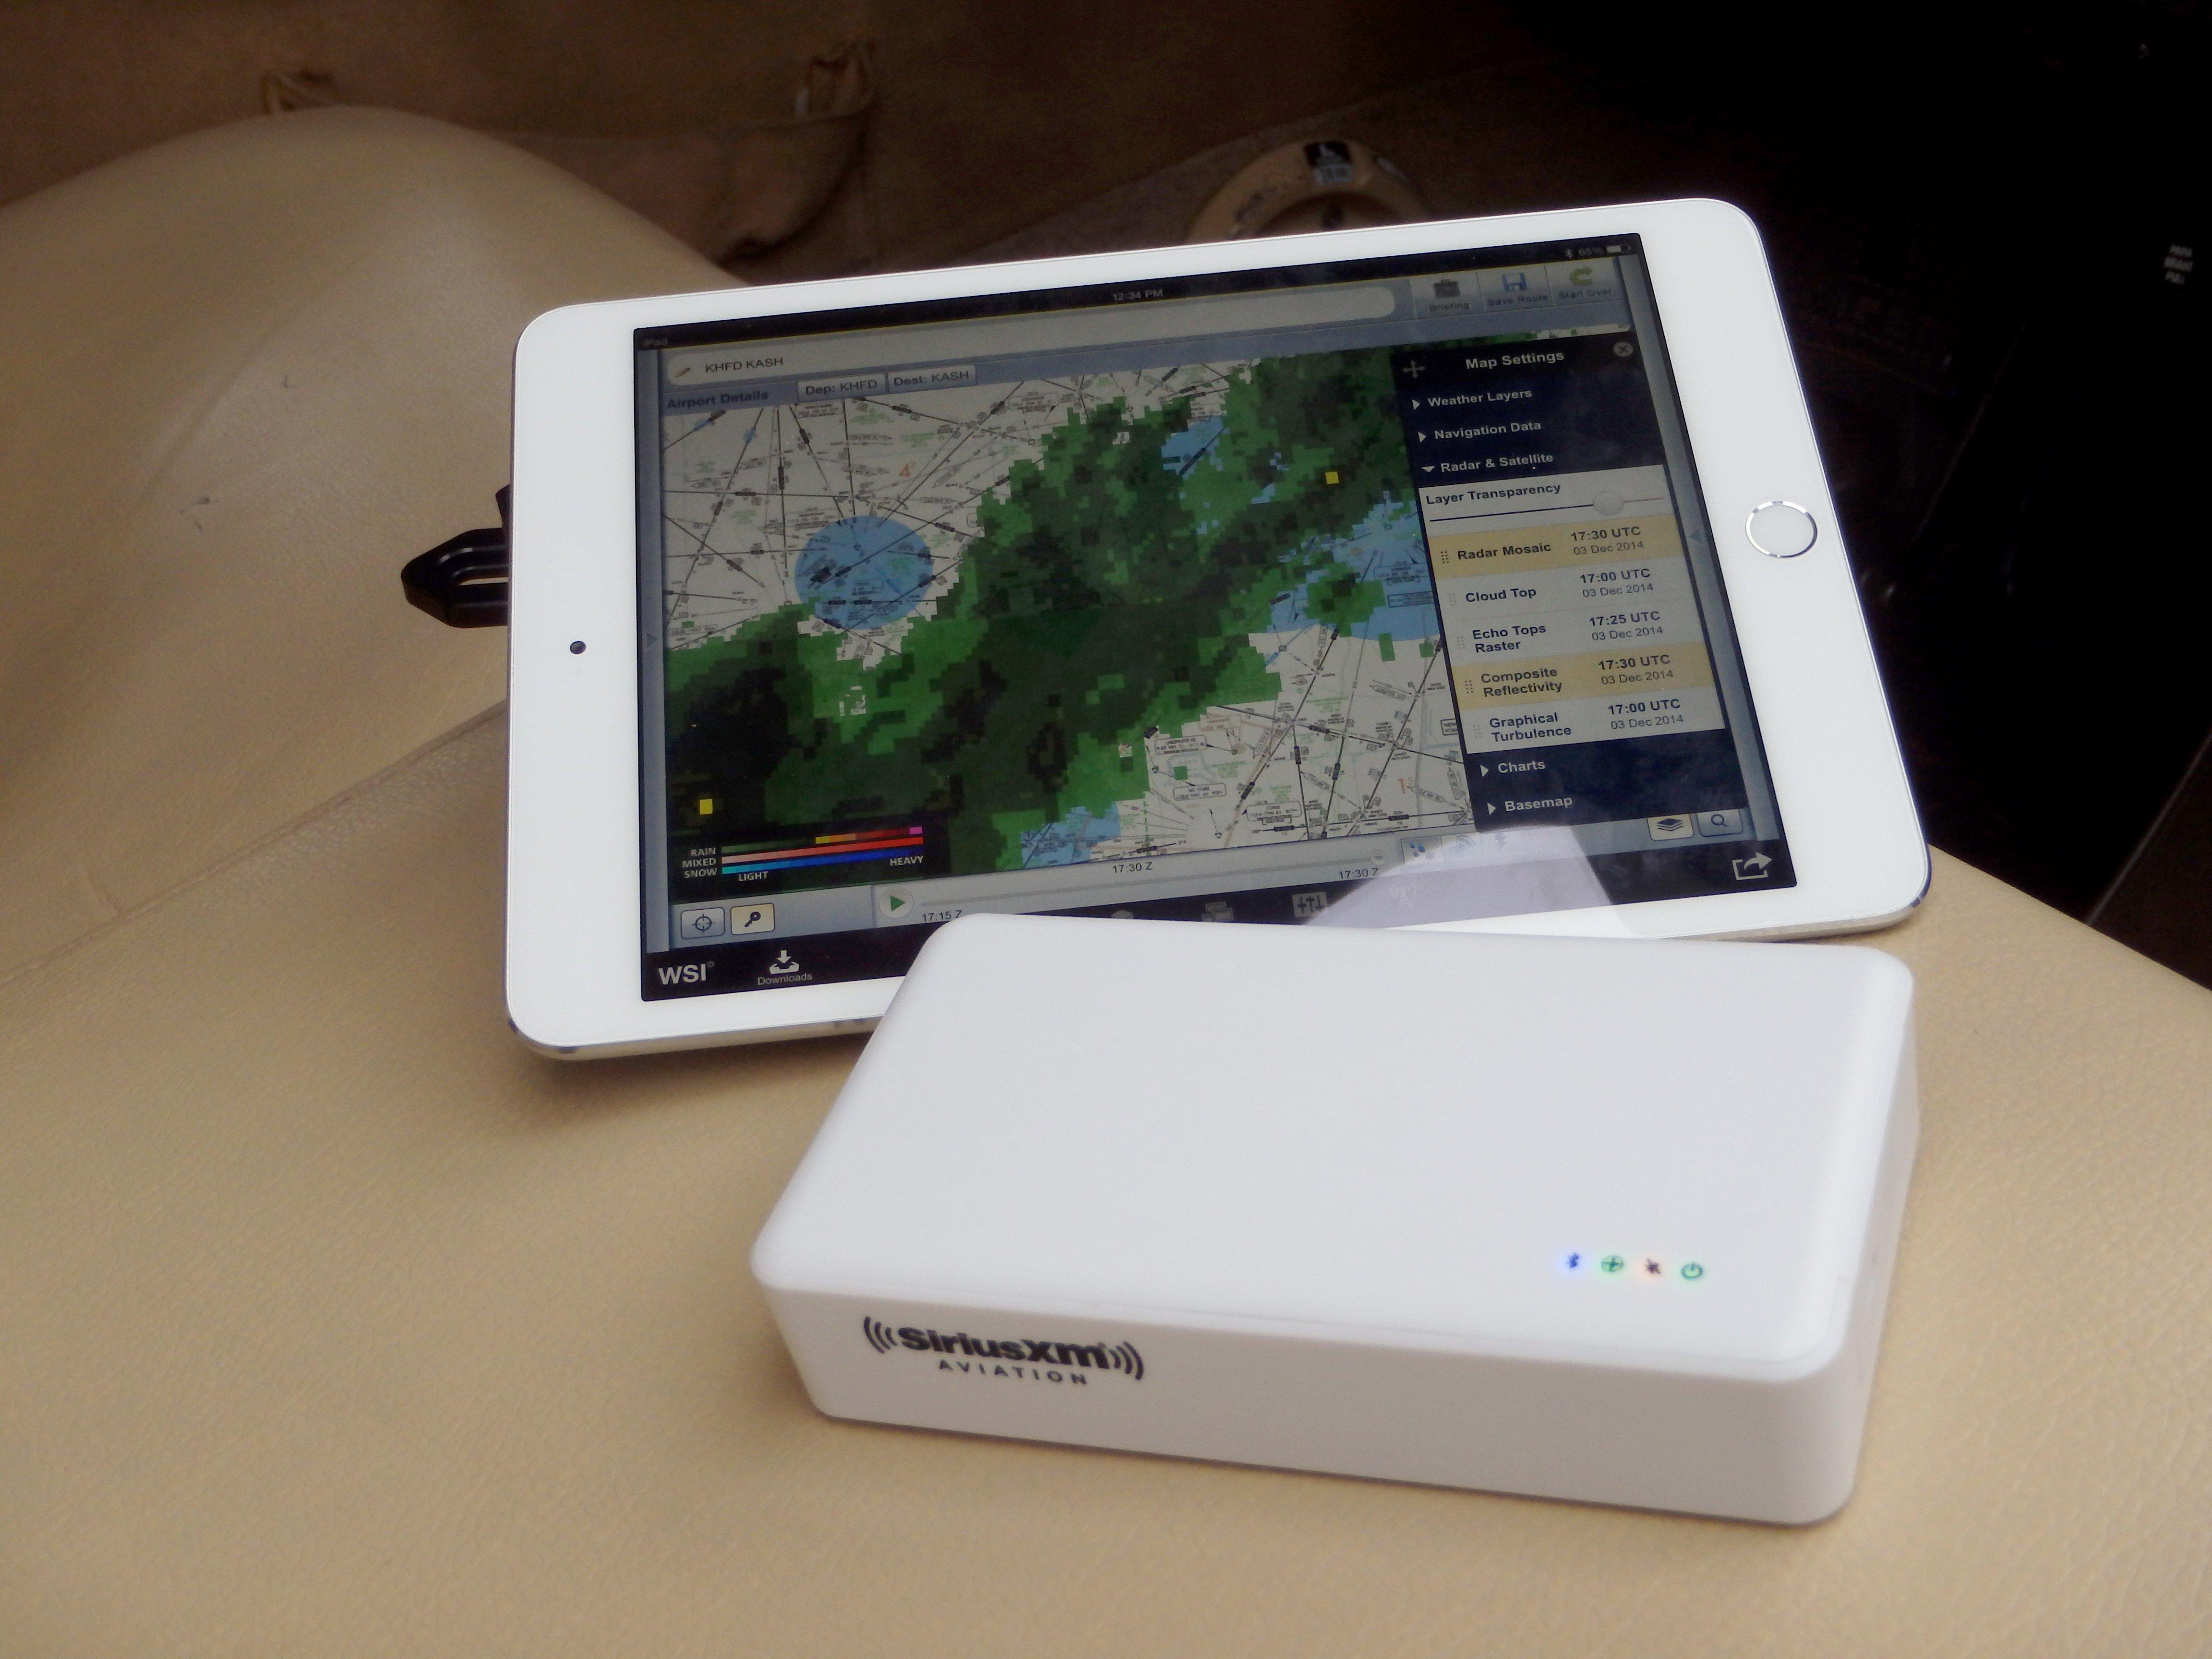 Siriusxm Wsi Unveil Wireless Weather